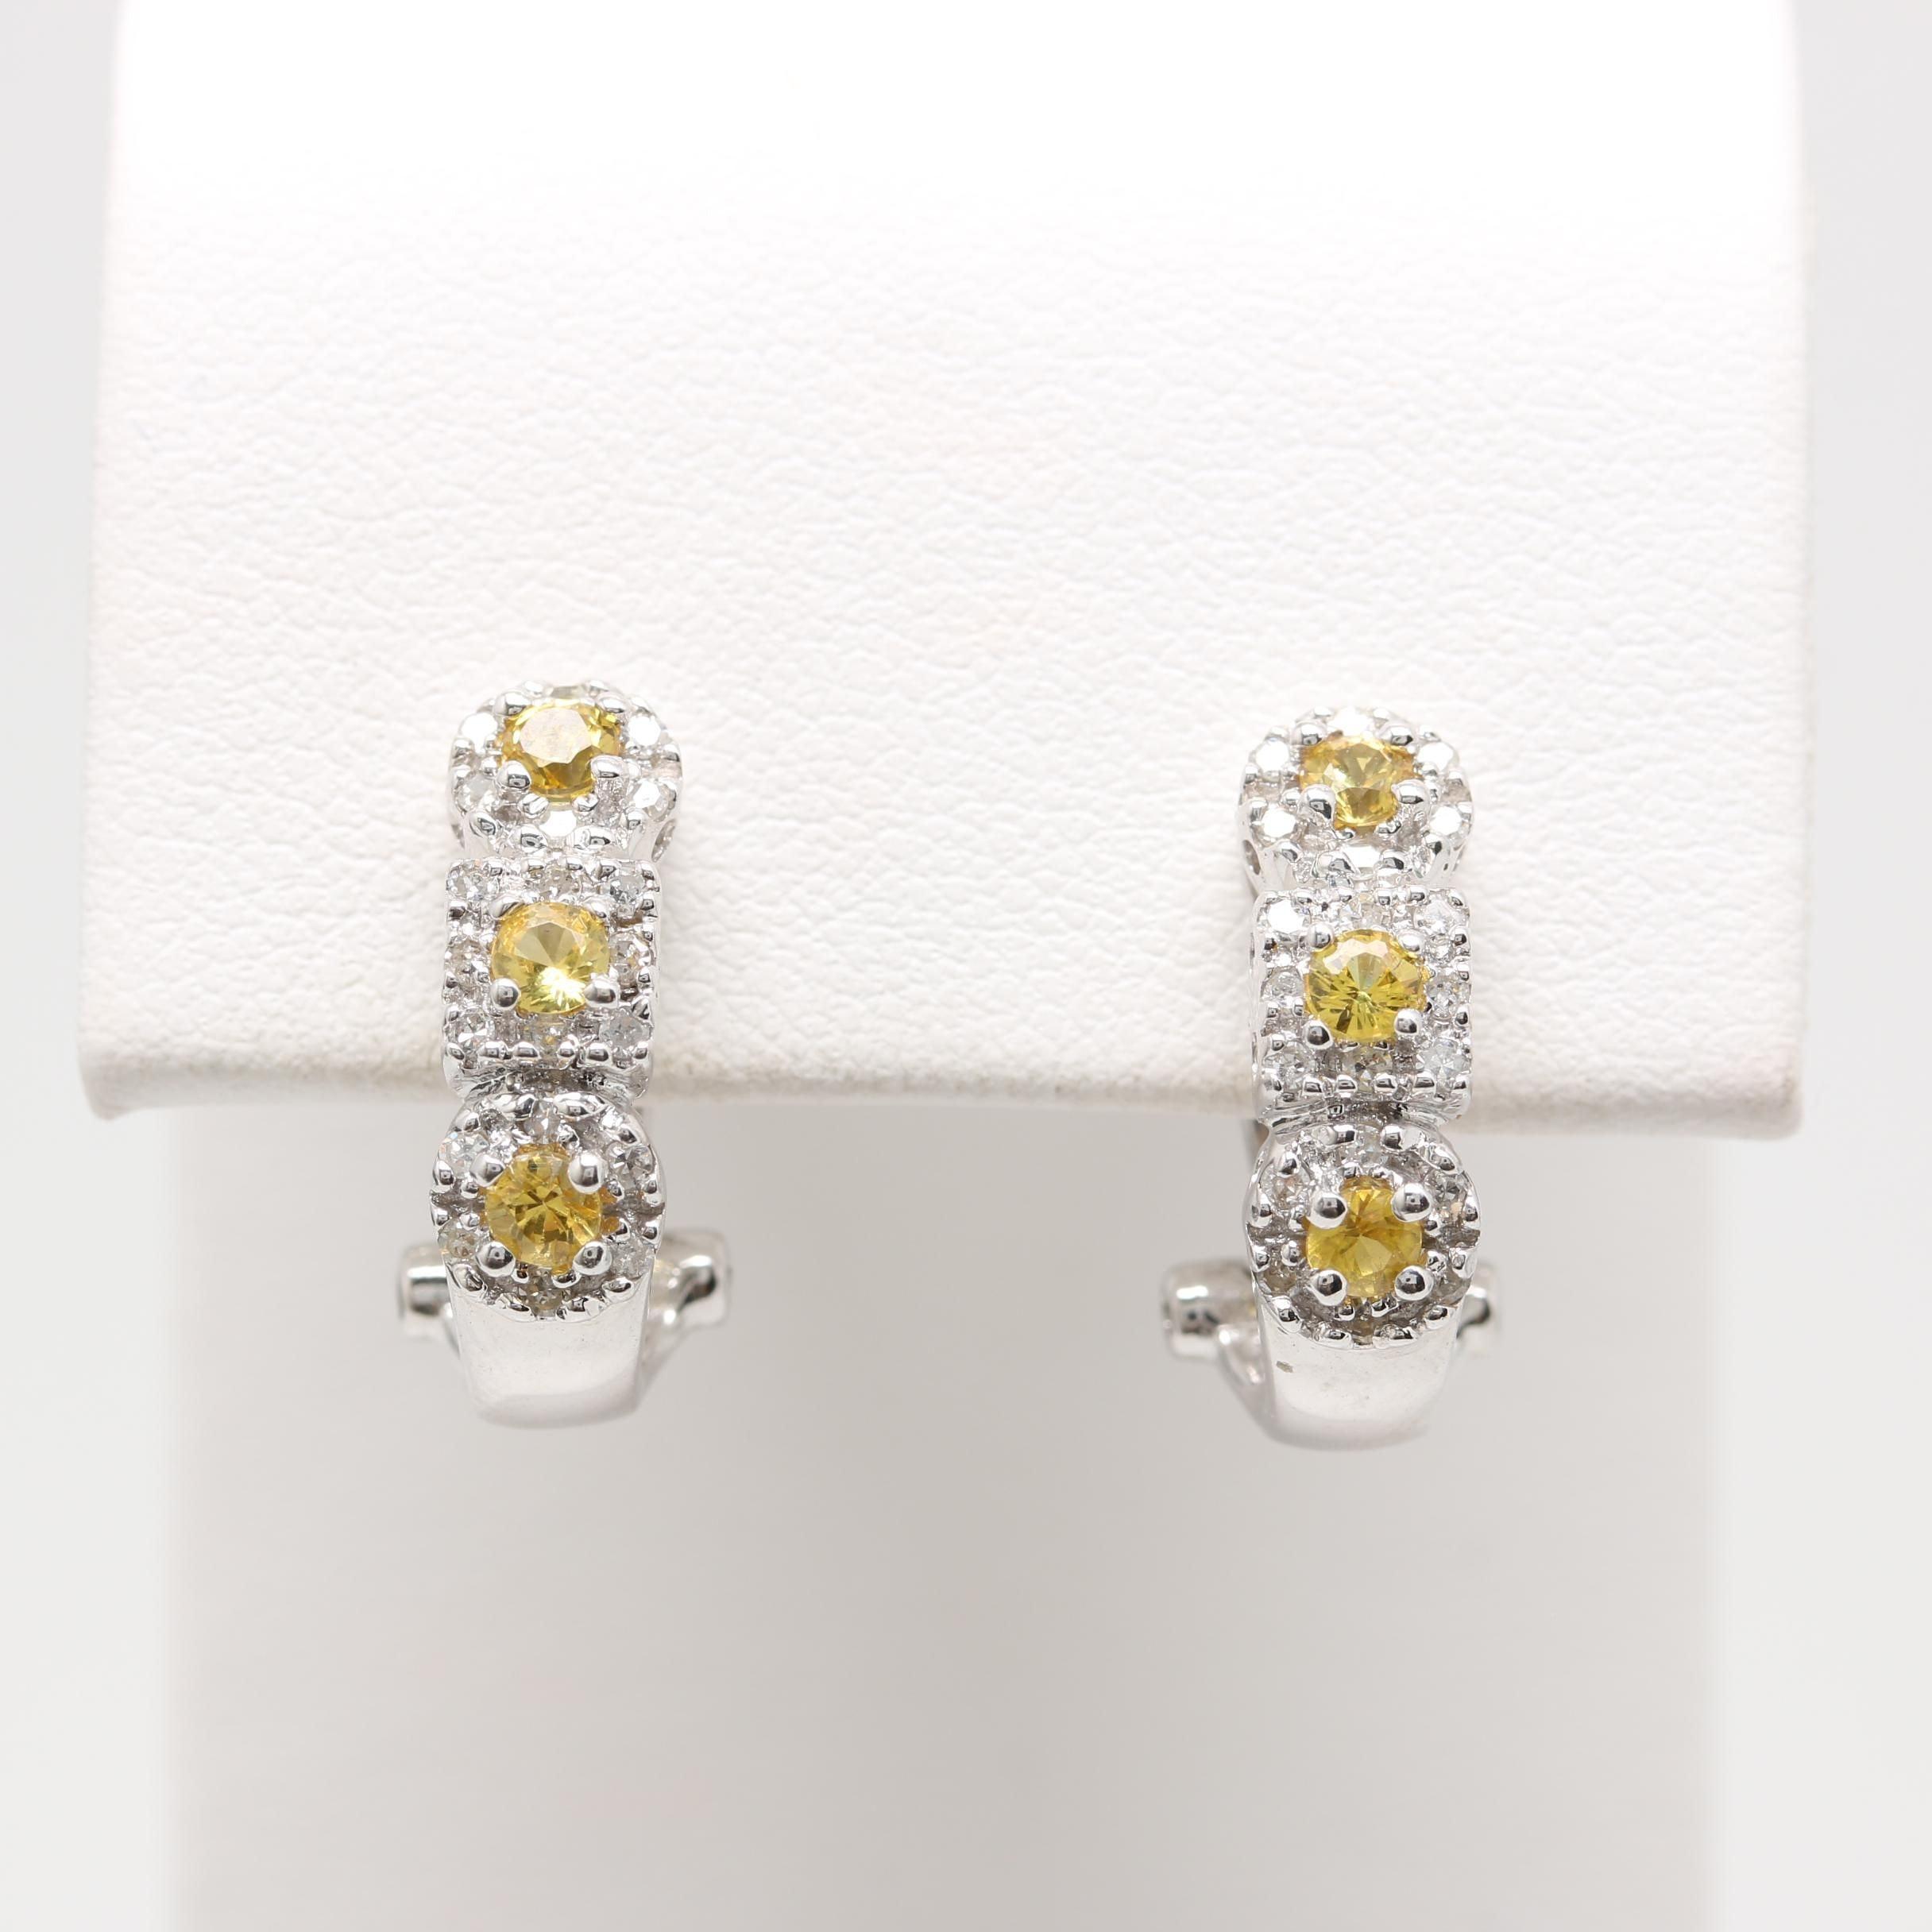 14K White Gold Yellow Sapphire and Diamond J-Hoop Earring